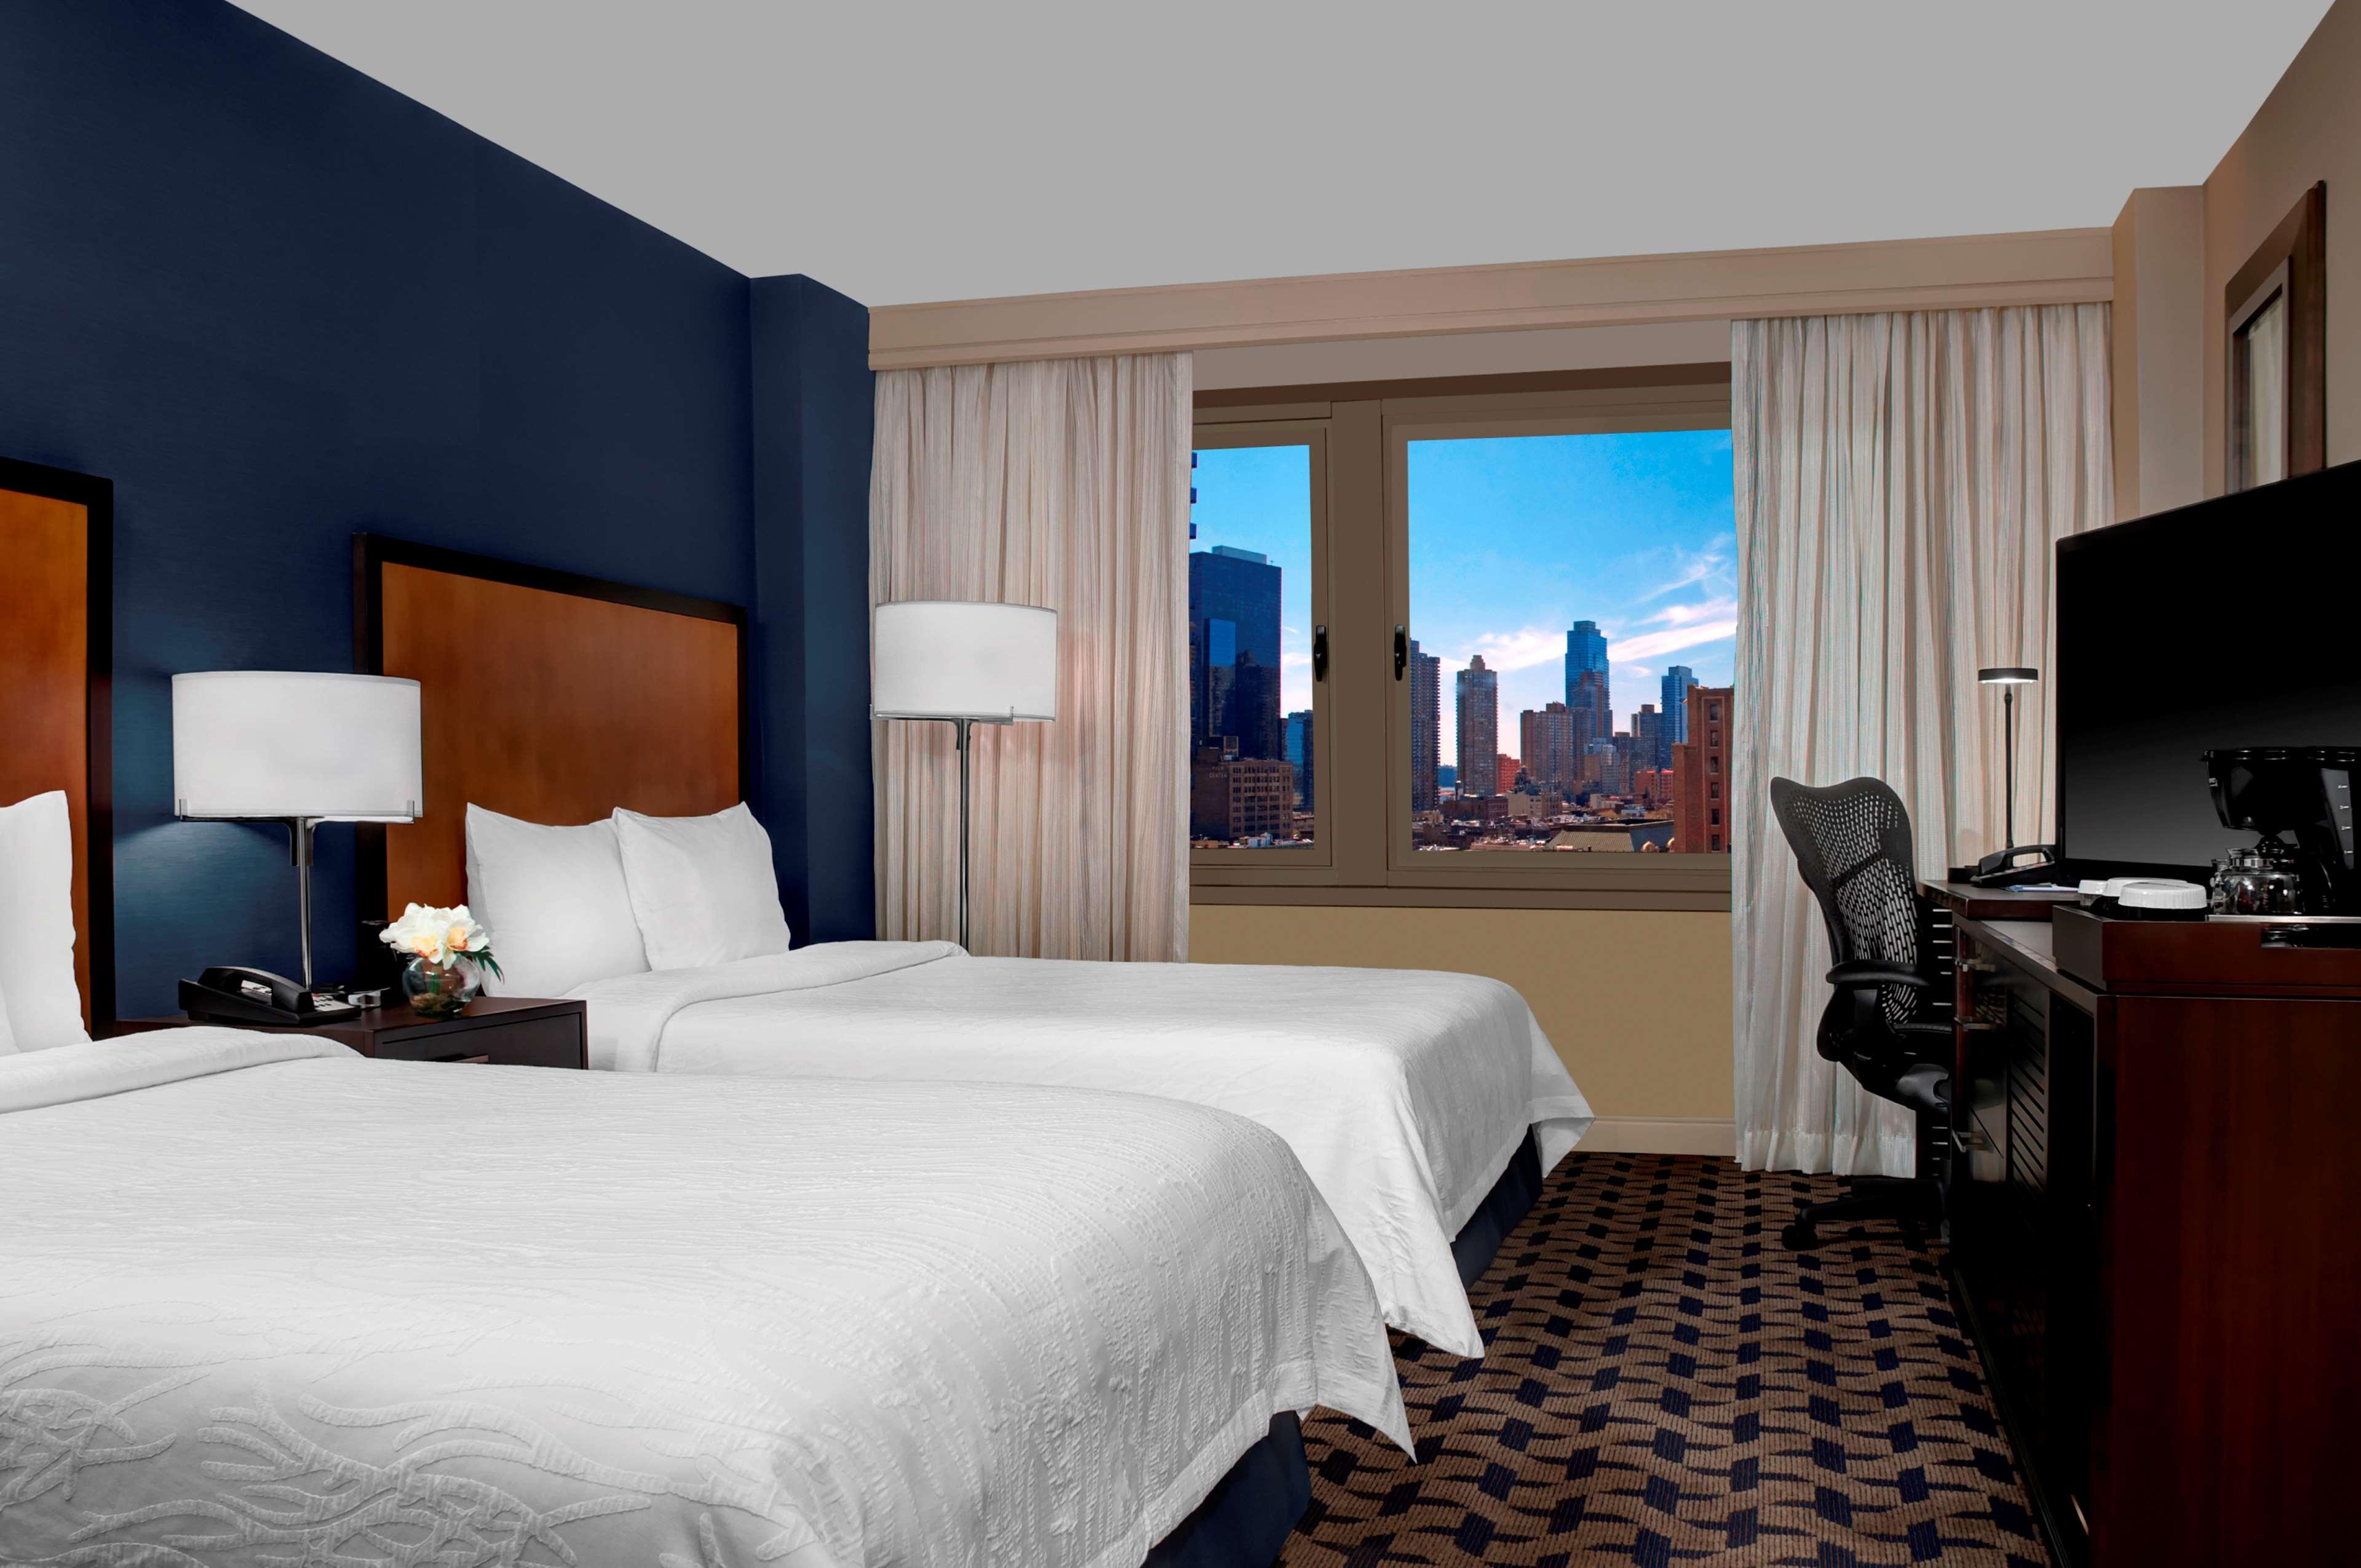 Hilton Garden Inn Times Square image 6